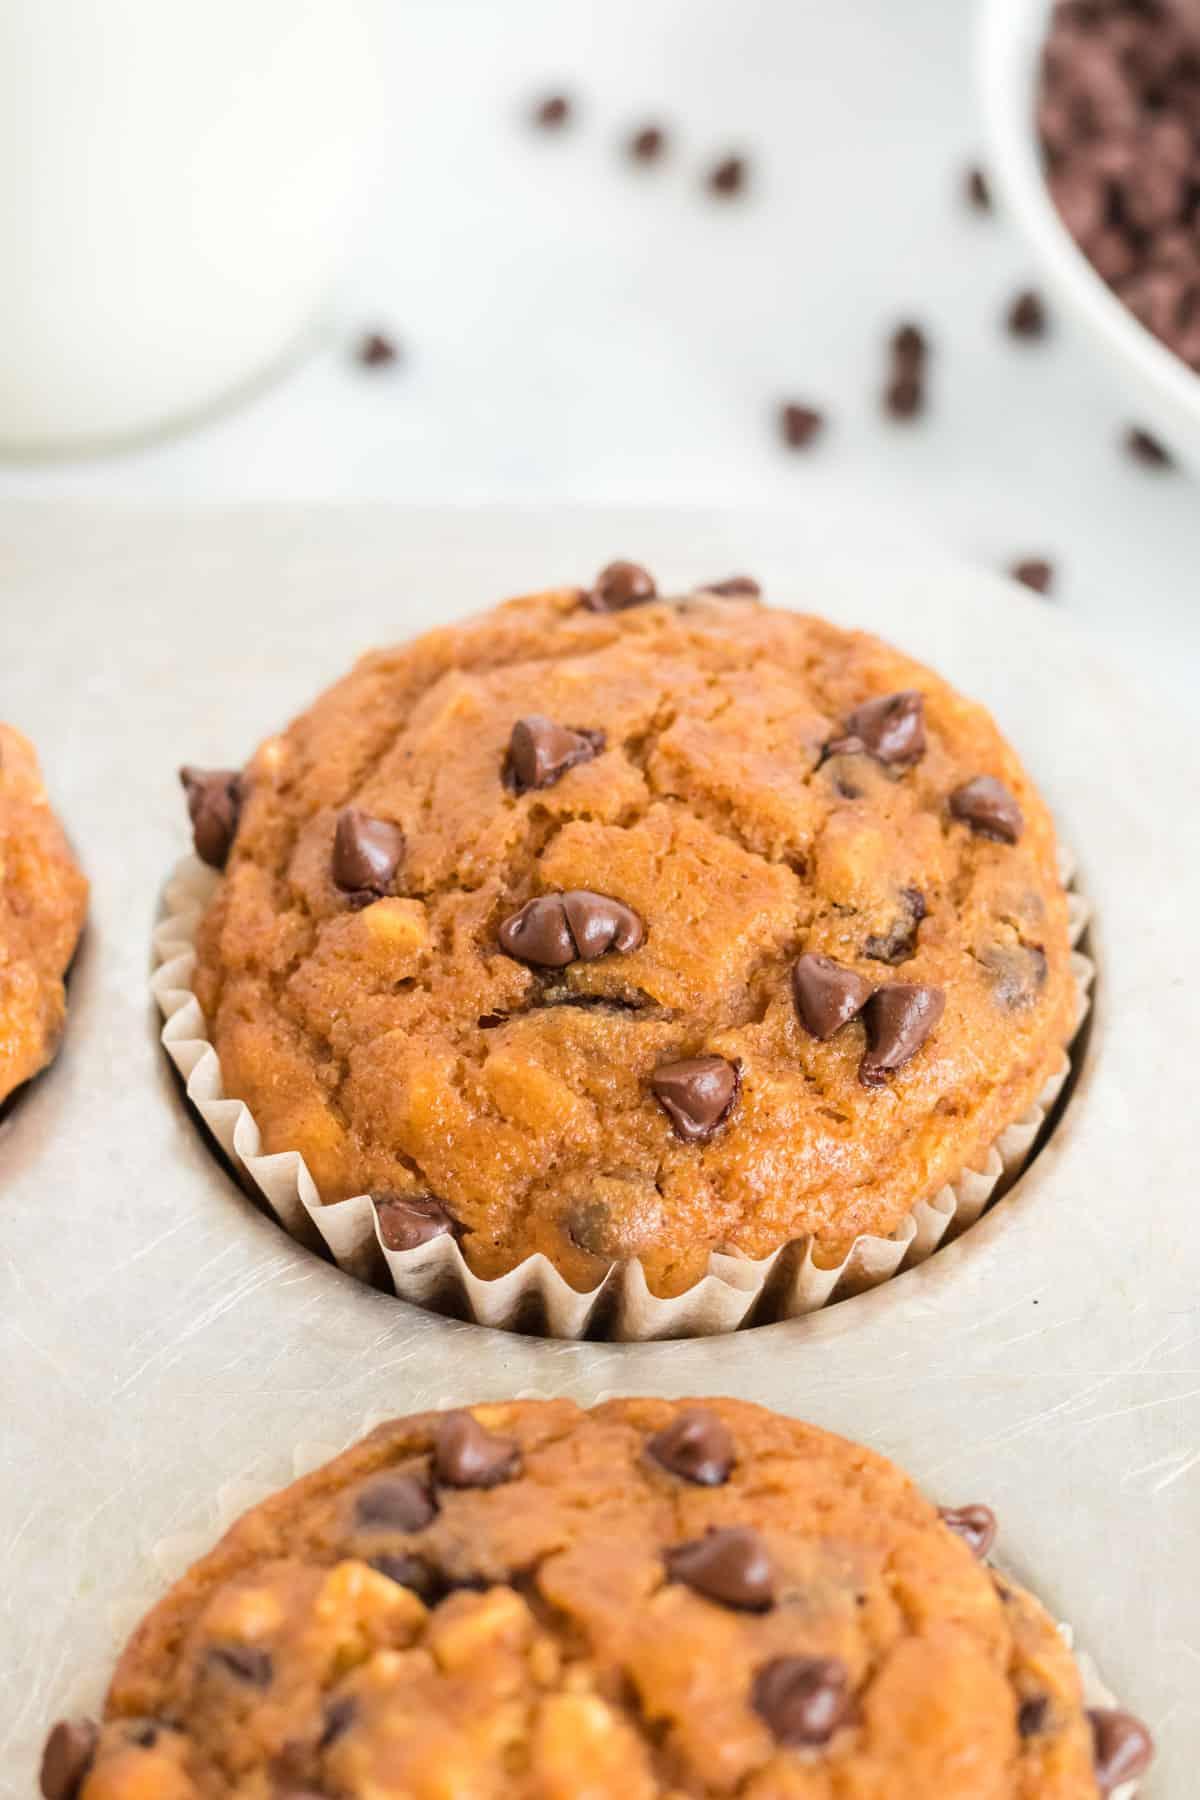 pumpkin chocolate chip muffin in the baking pan